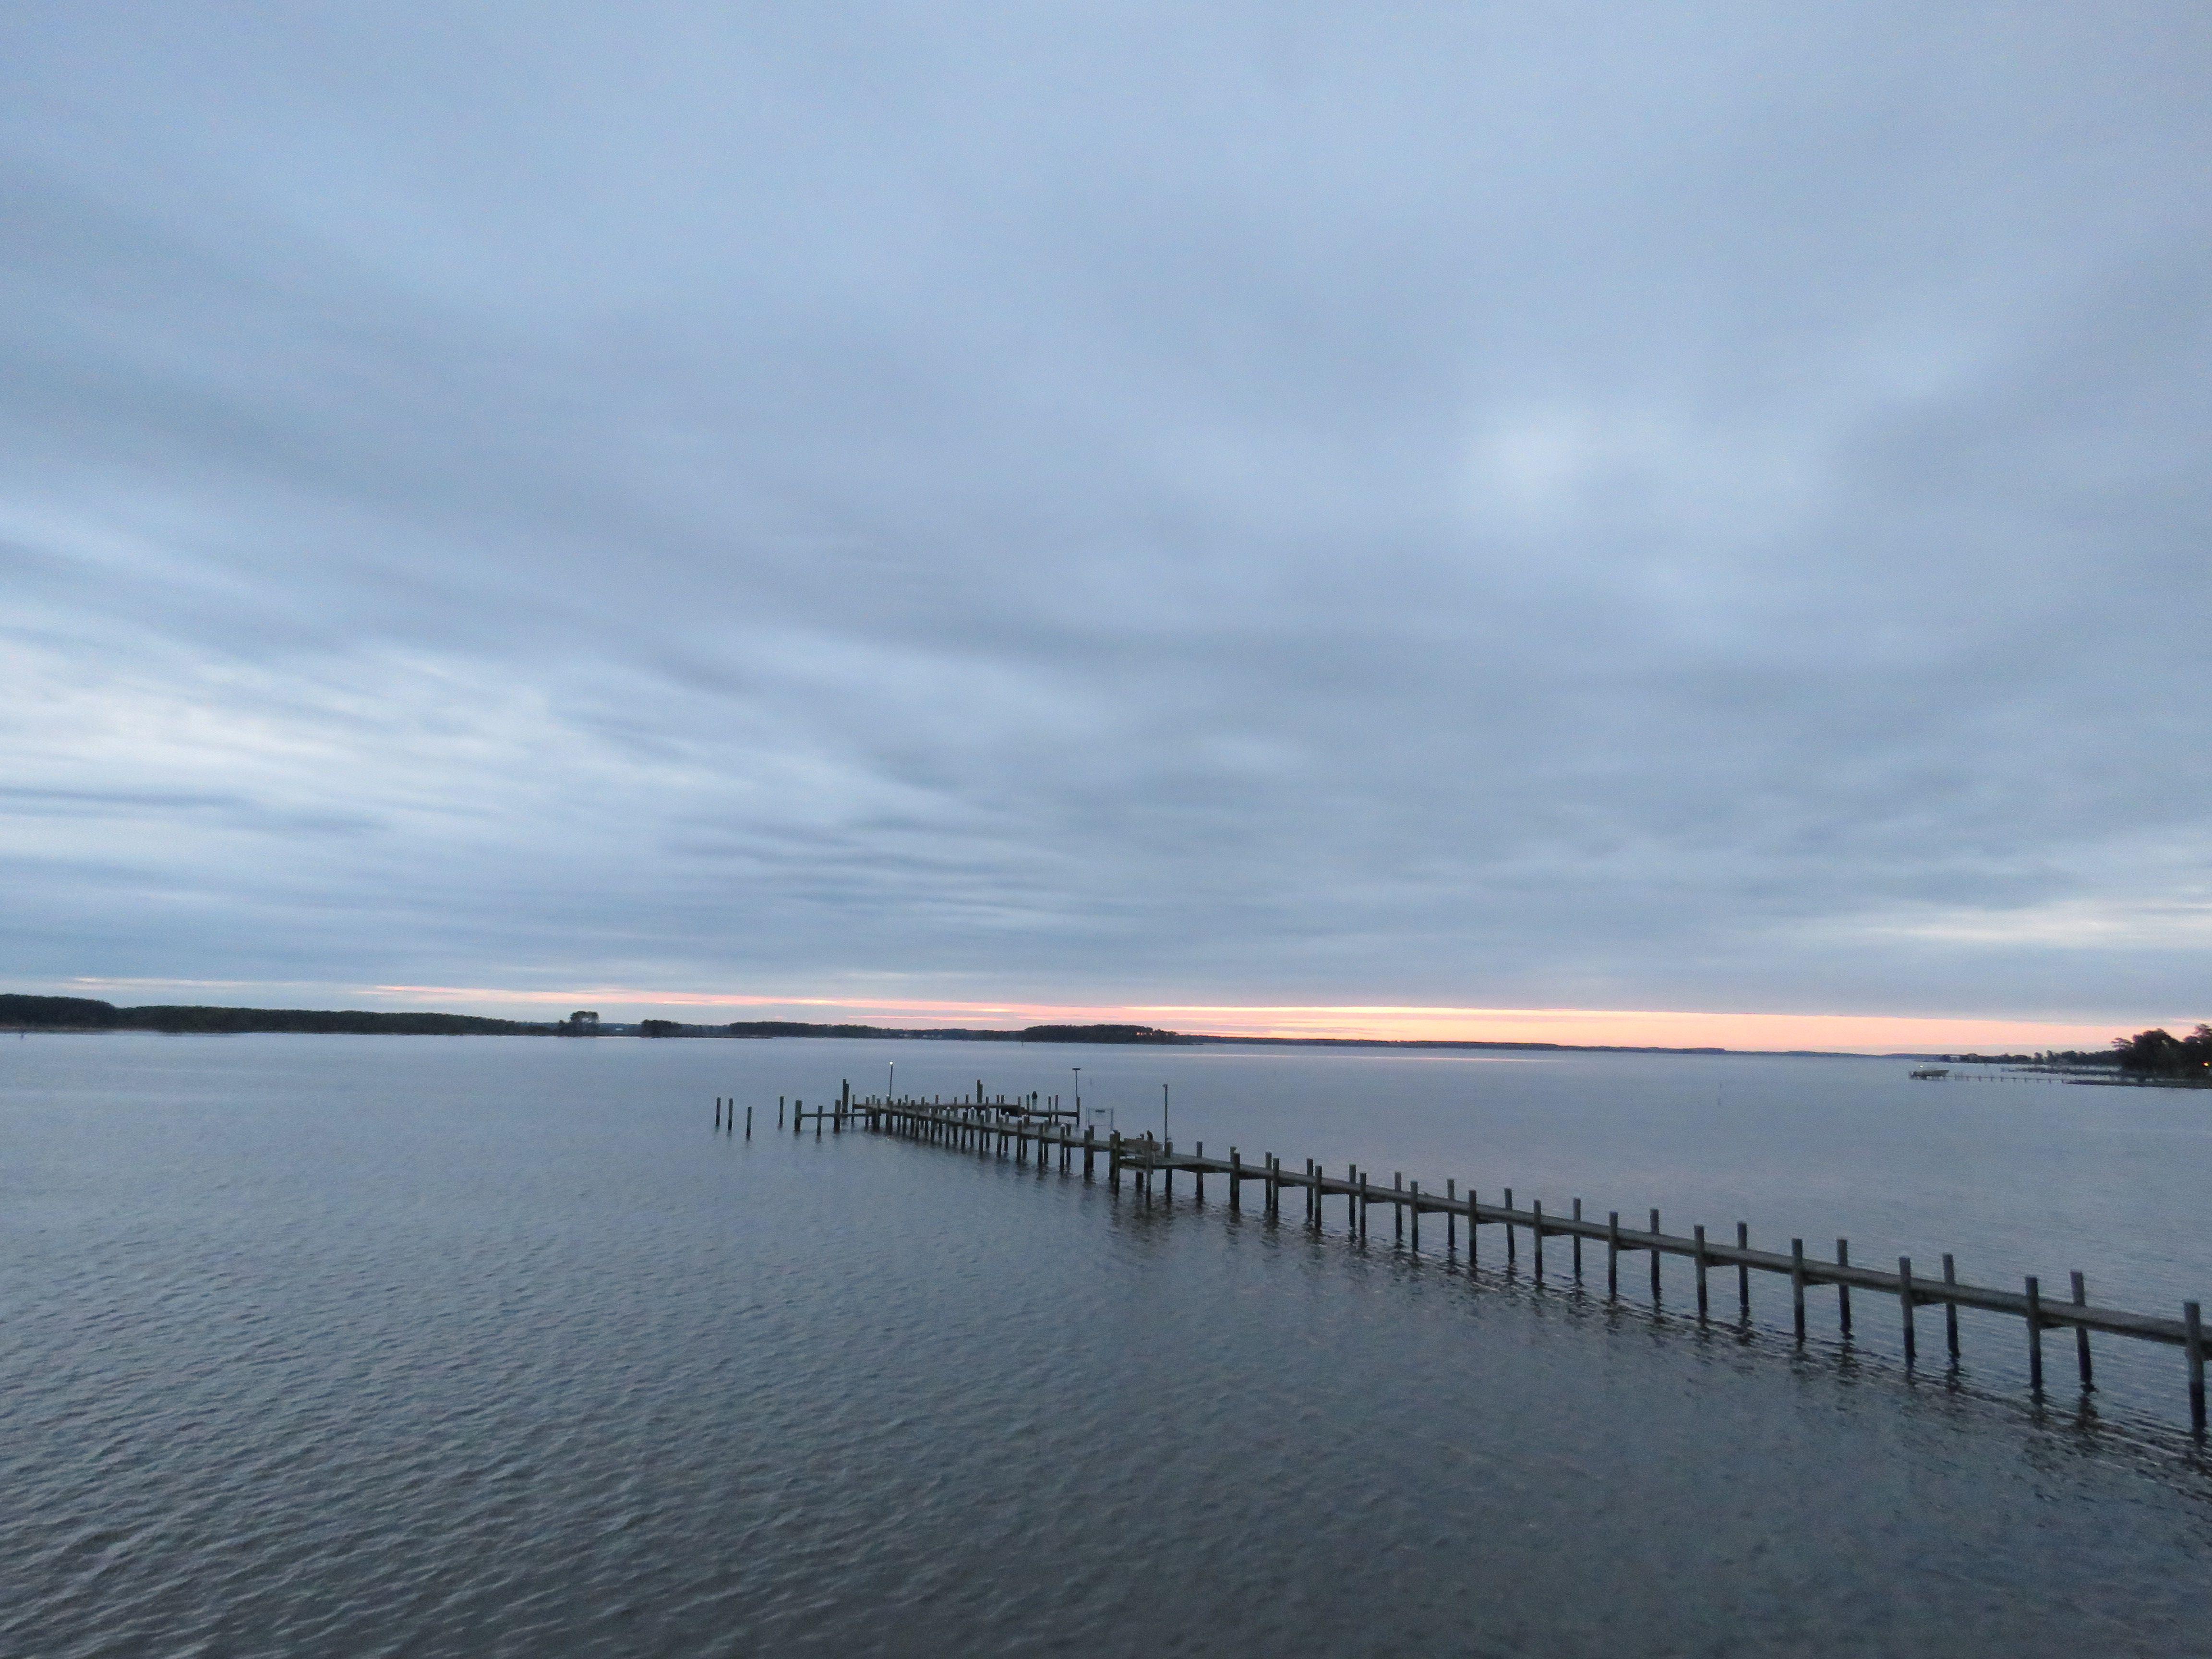 St. George Island / Southern Maryland